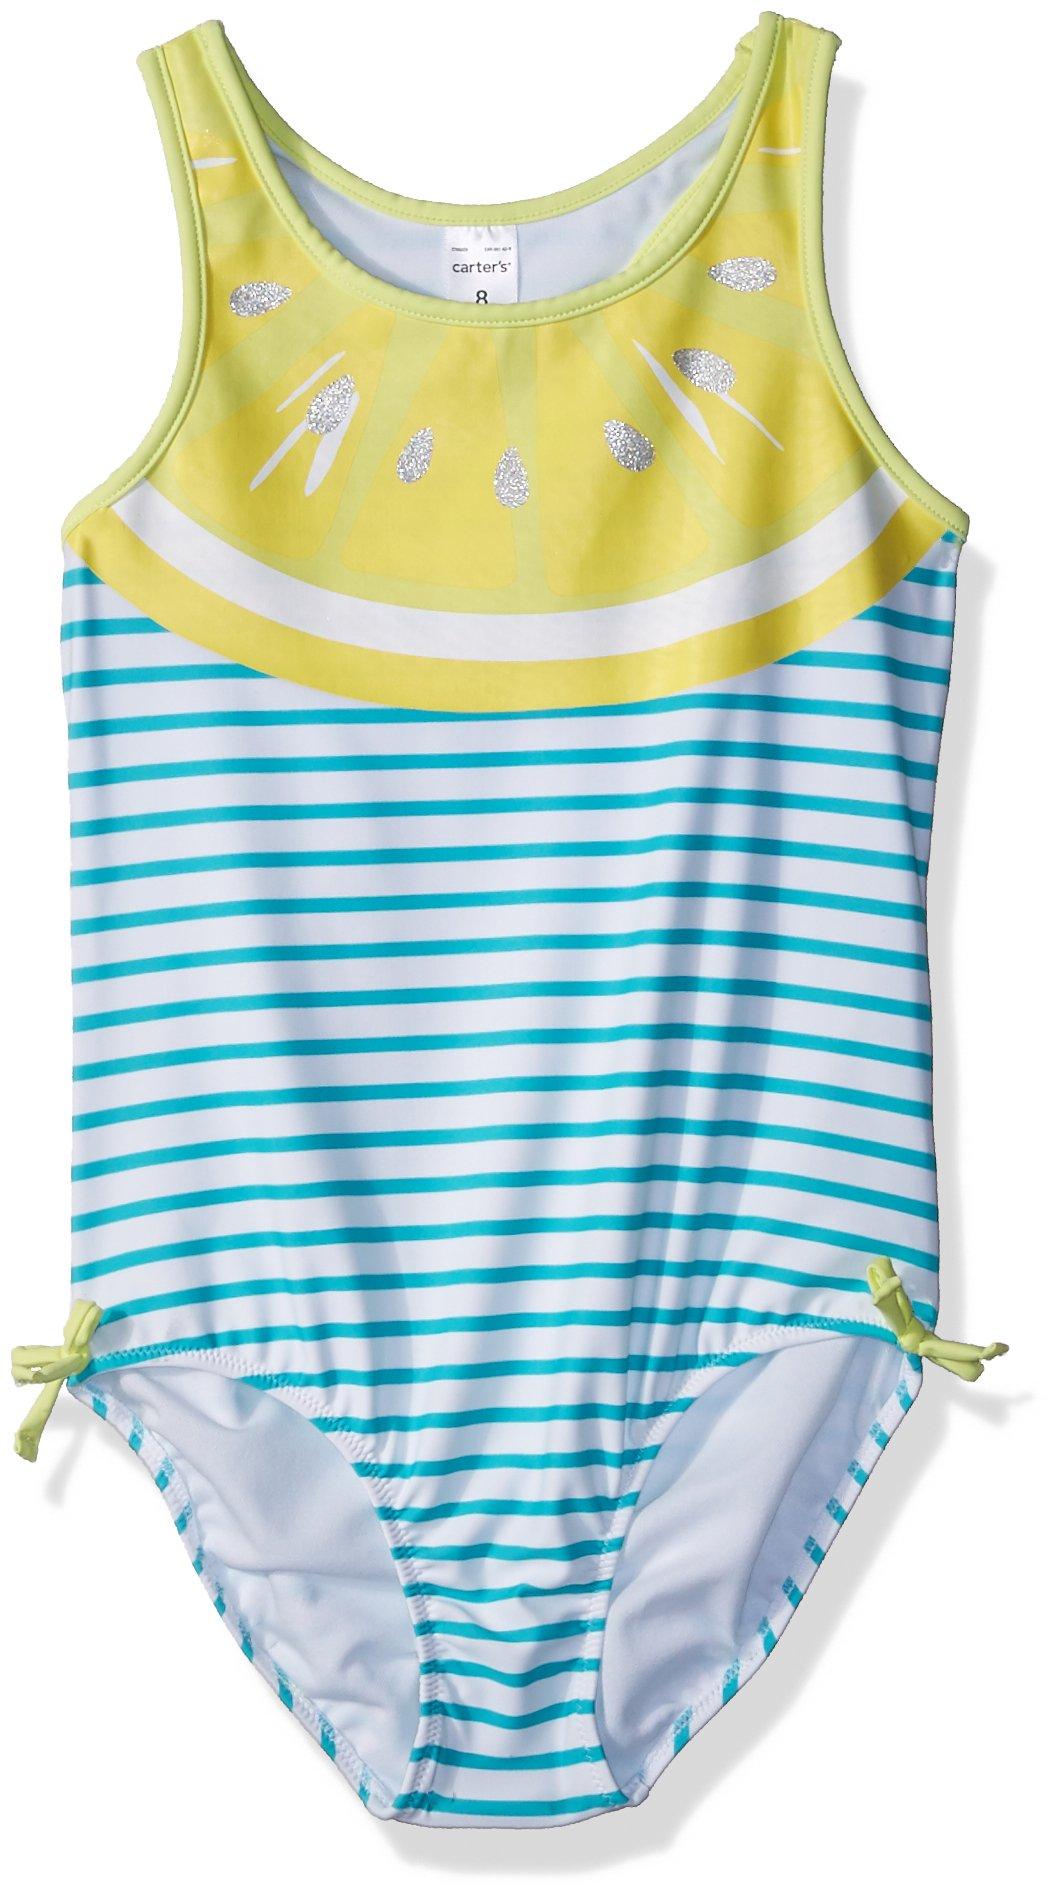 Carter's Girls' Toddler One Piece Swimsuit, Lemon Stripe, 4T